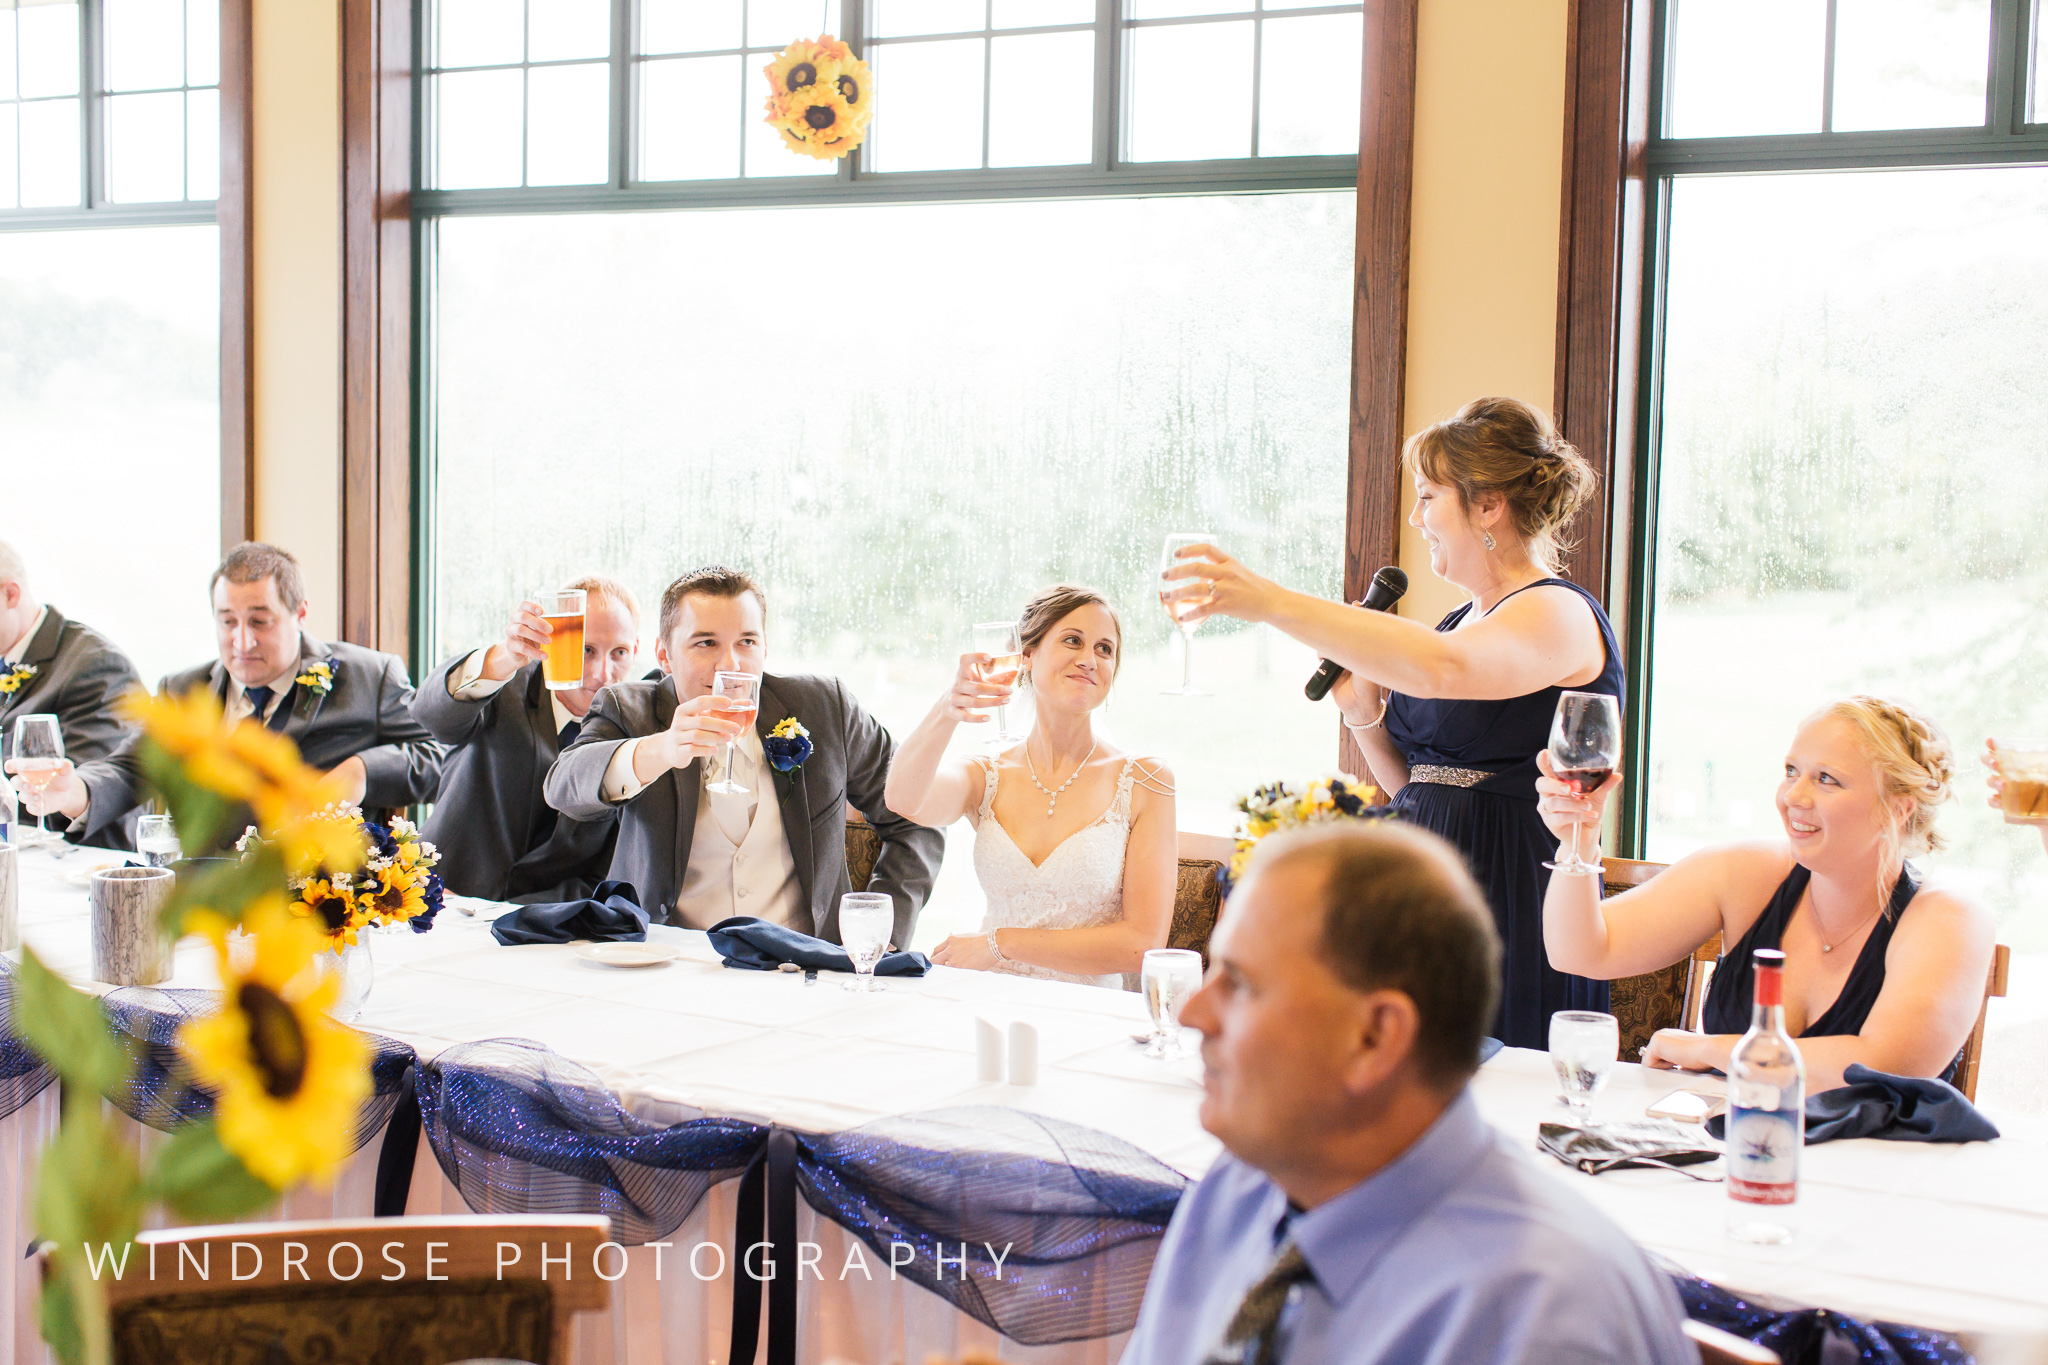 La-Crosse-Country-Club-Wedding-Minnesota-Wedding-Photographer-38.jpg